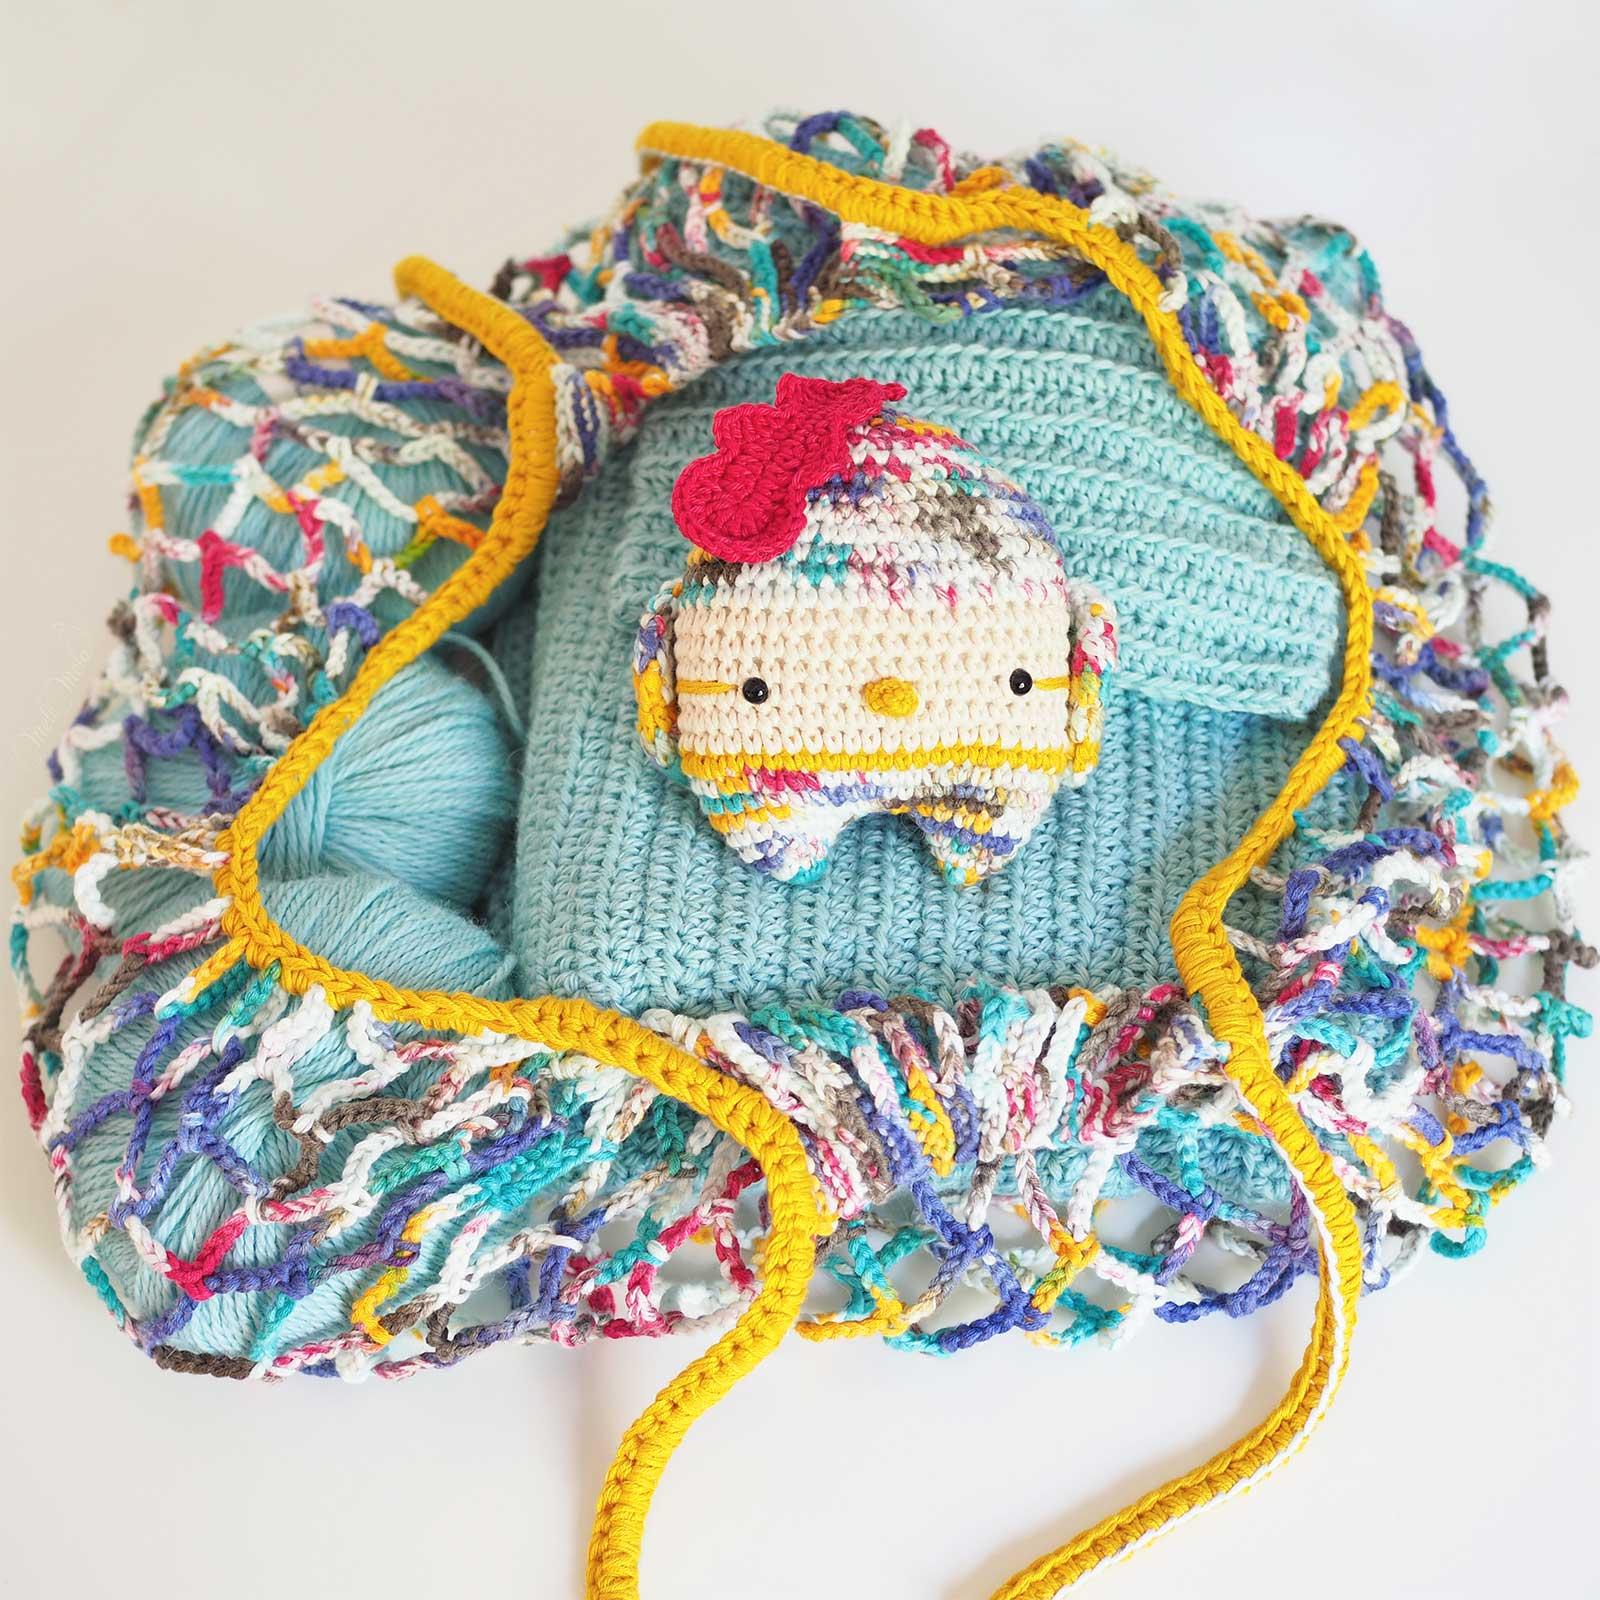 crochet market bag titus bird lalylala outstandingcrochet boutique melimelo